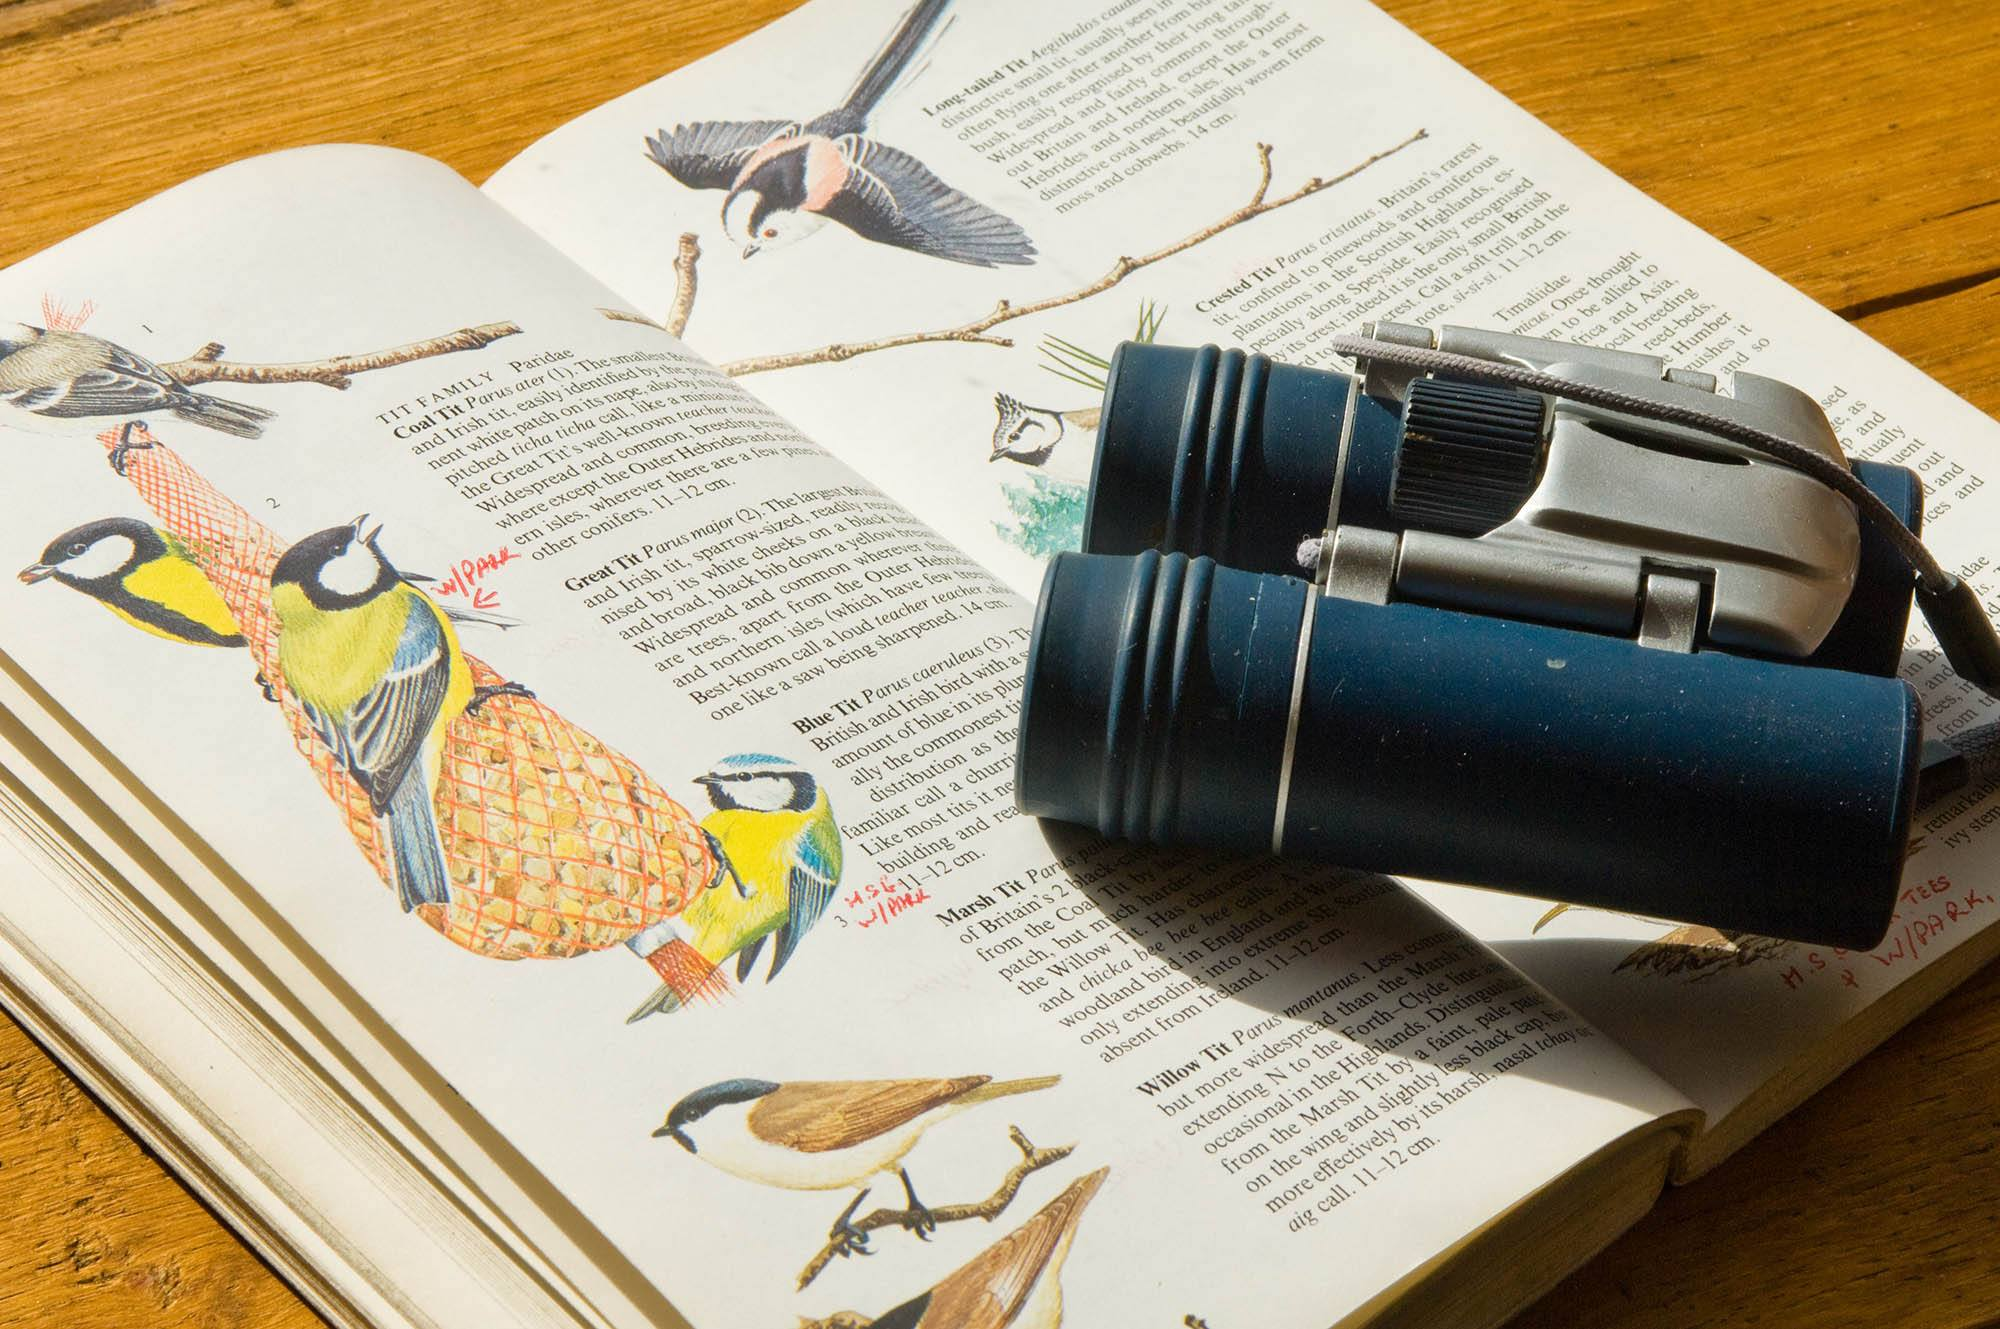 dover wild life, bird spotting